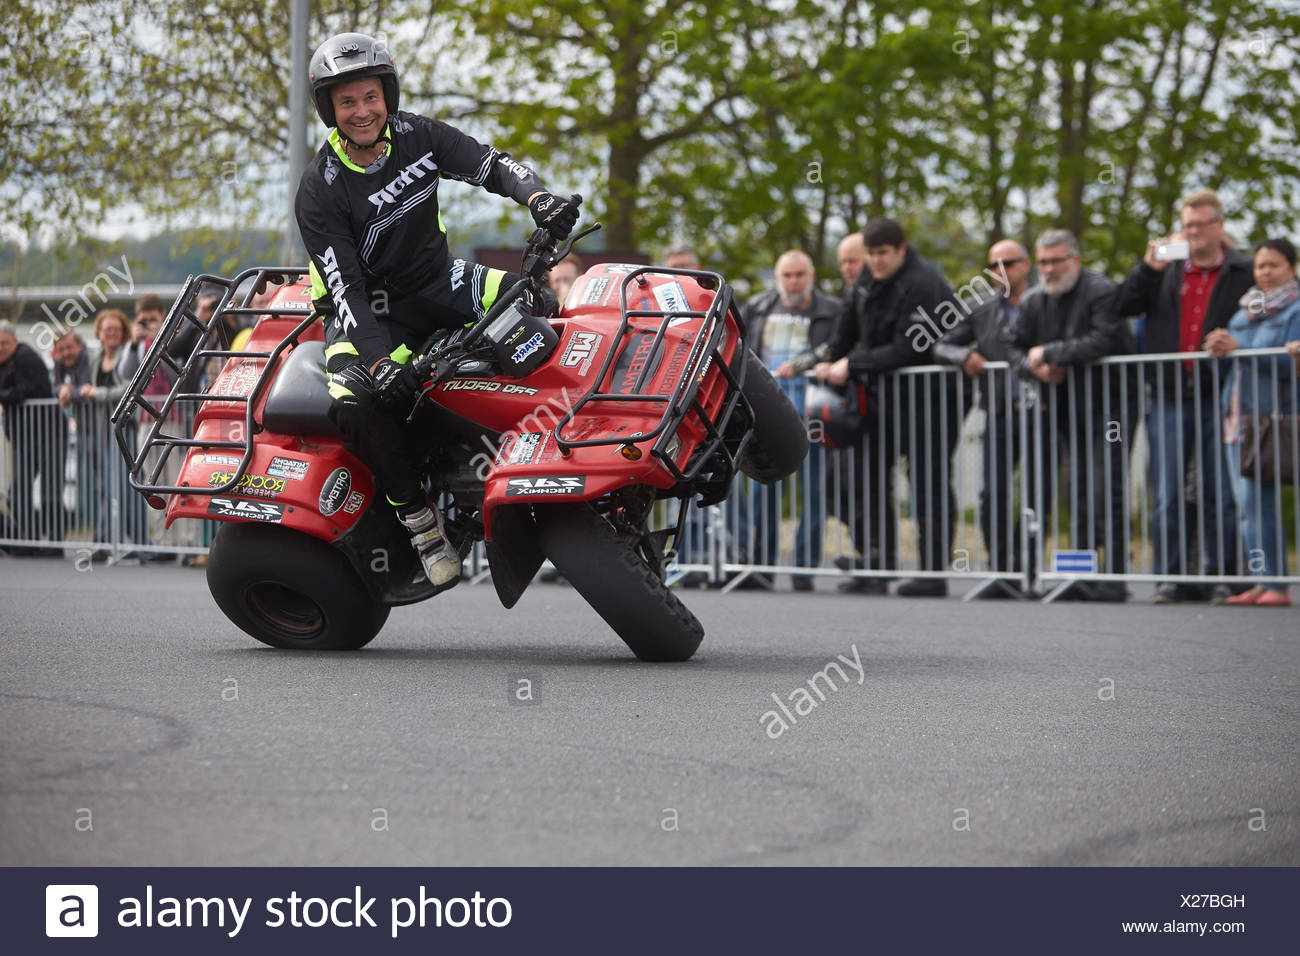 Motorcycle stuntman Mike Auffenberg on a quad bike during the ADAC motorbike startup day, Koblenz, Rhineland-Palatinate, Germany - Stock Image